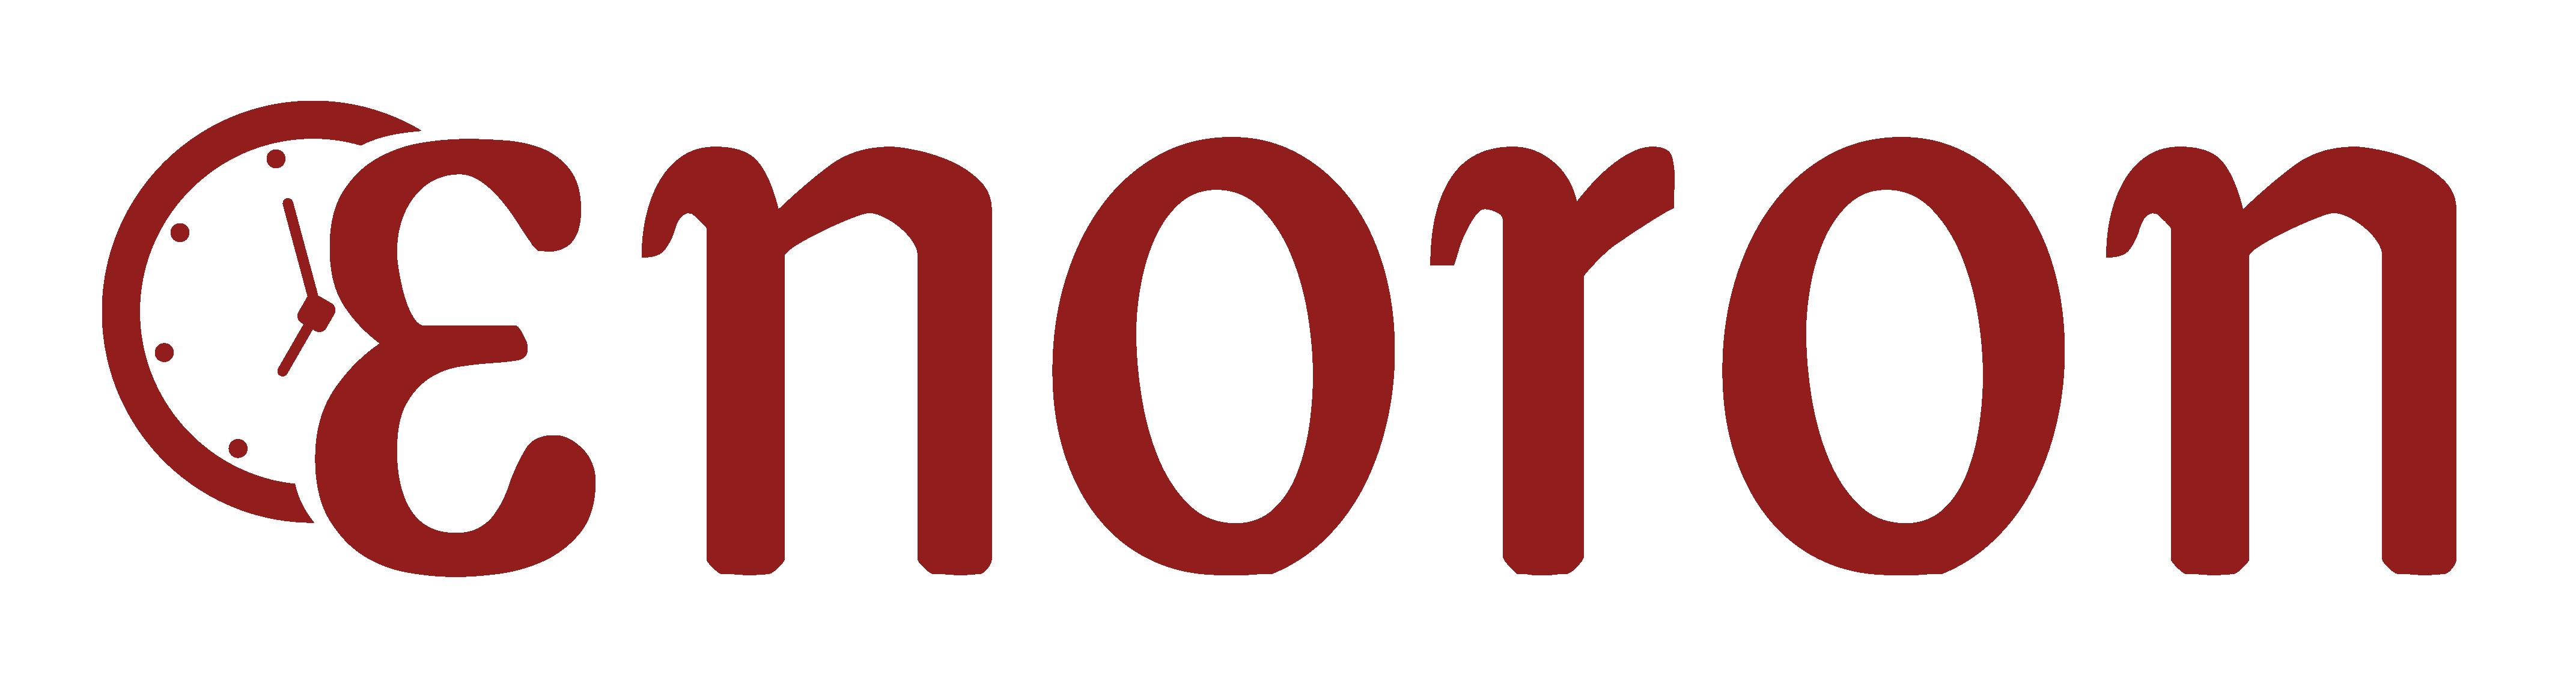 Enoron